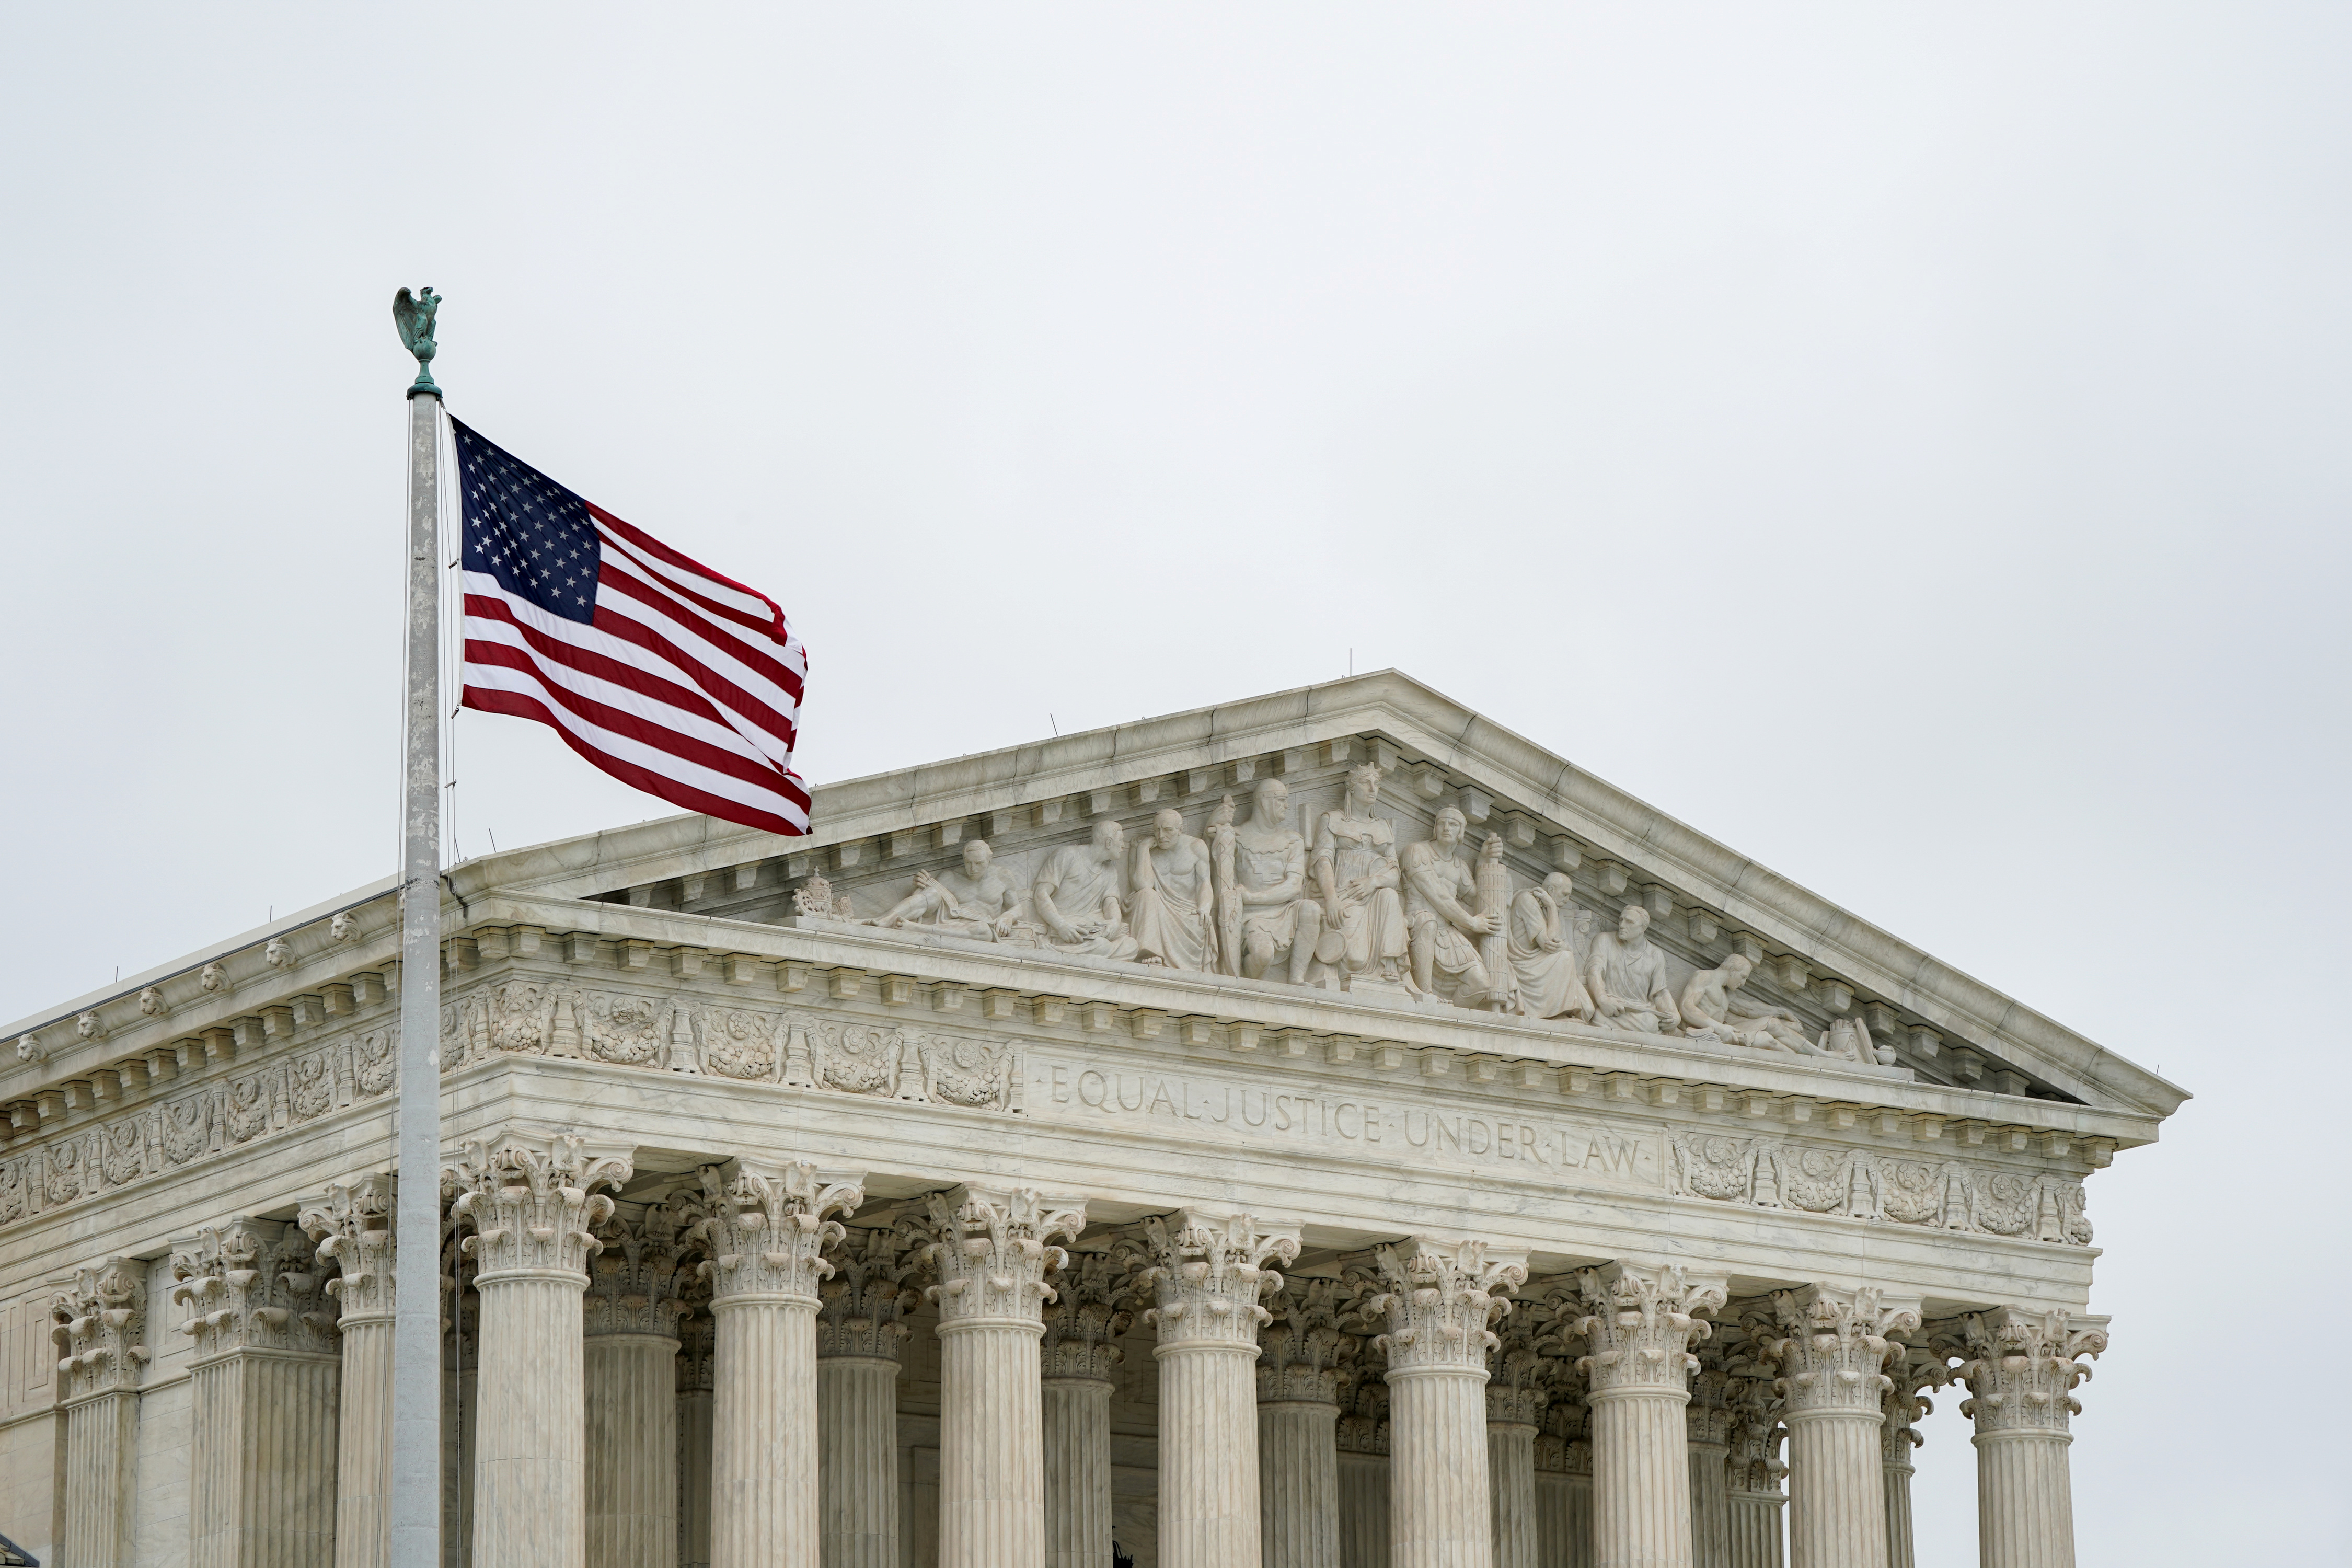 Supreme Court turns away Pennsylvania electoral map dispute